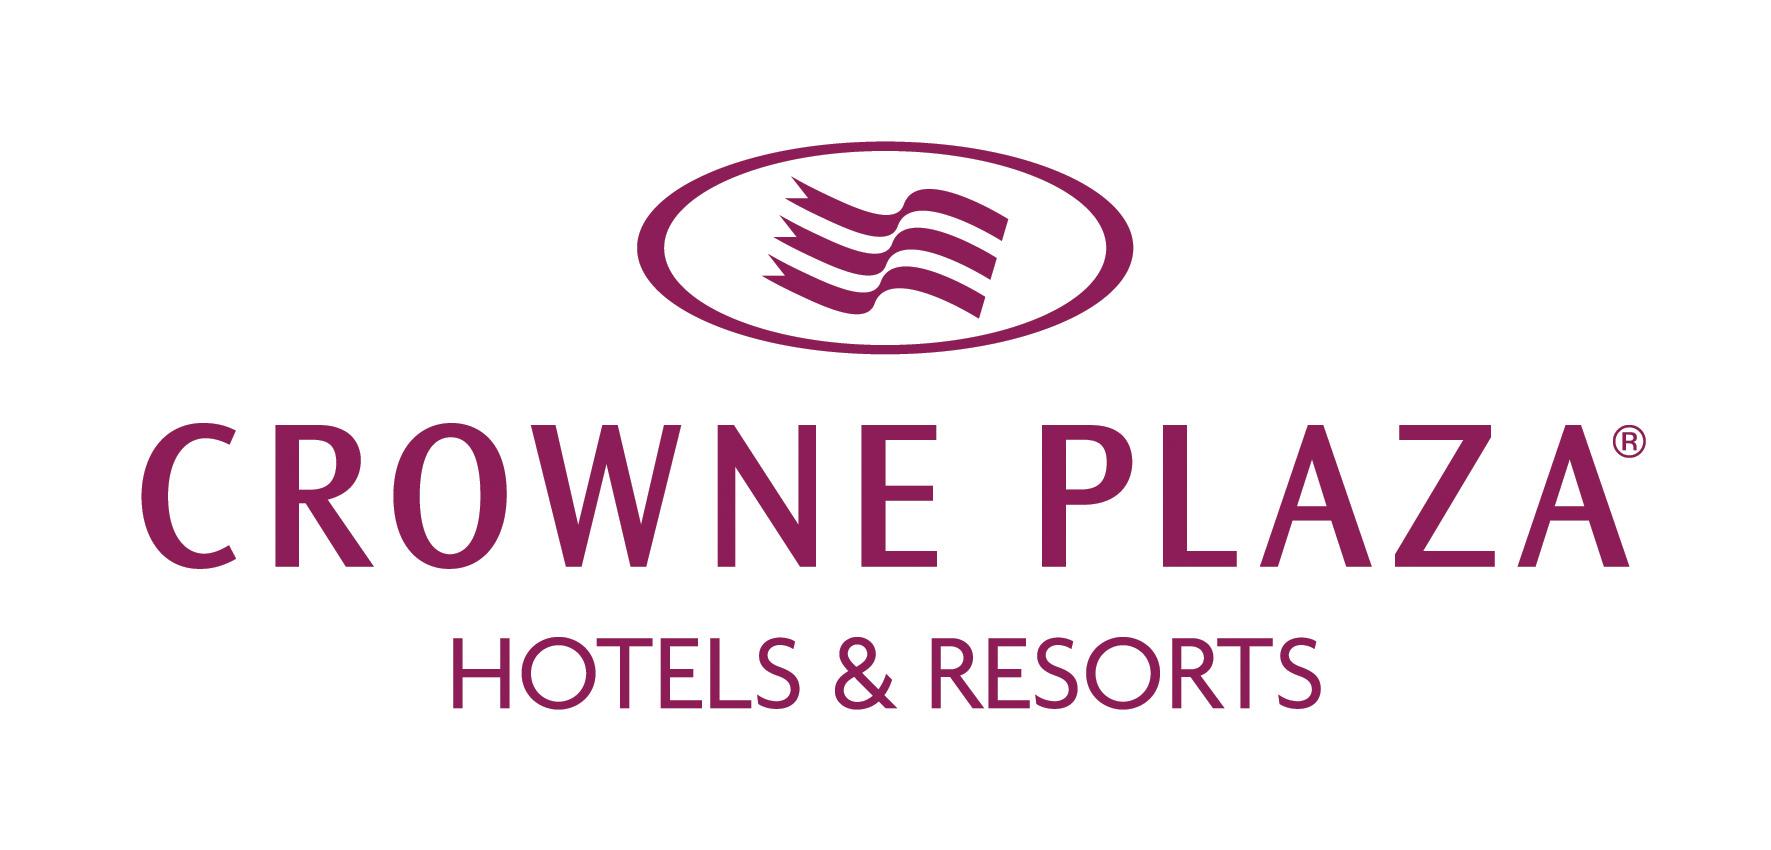 crowne-plaza_logo.jpg